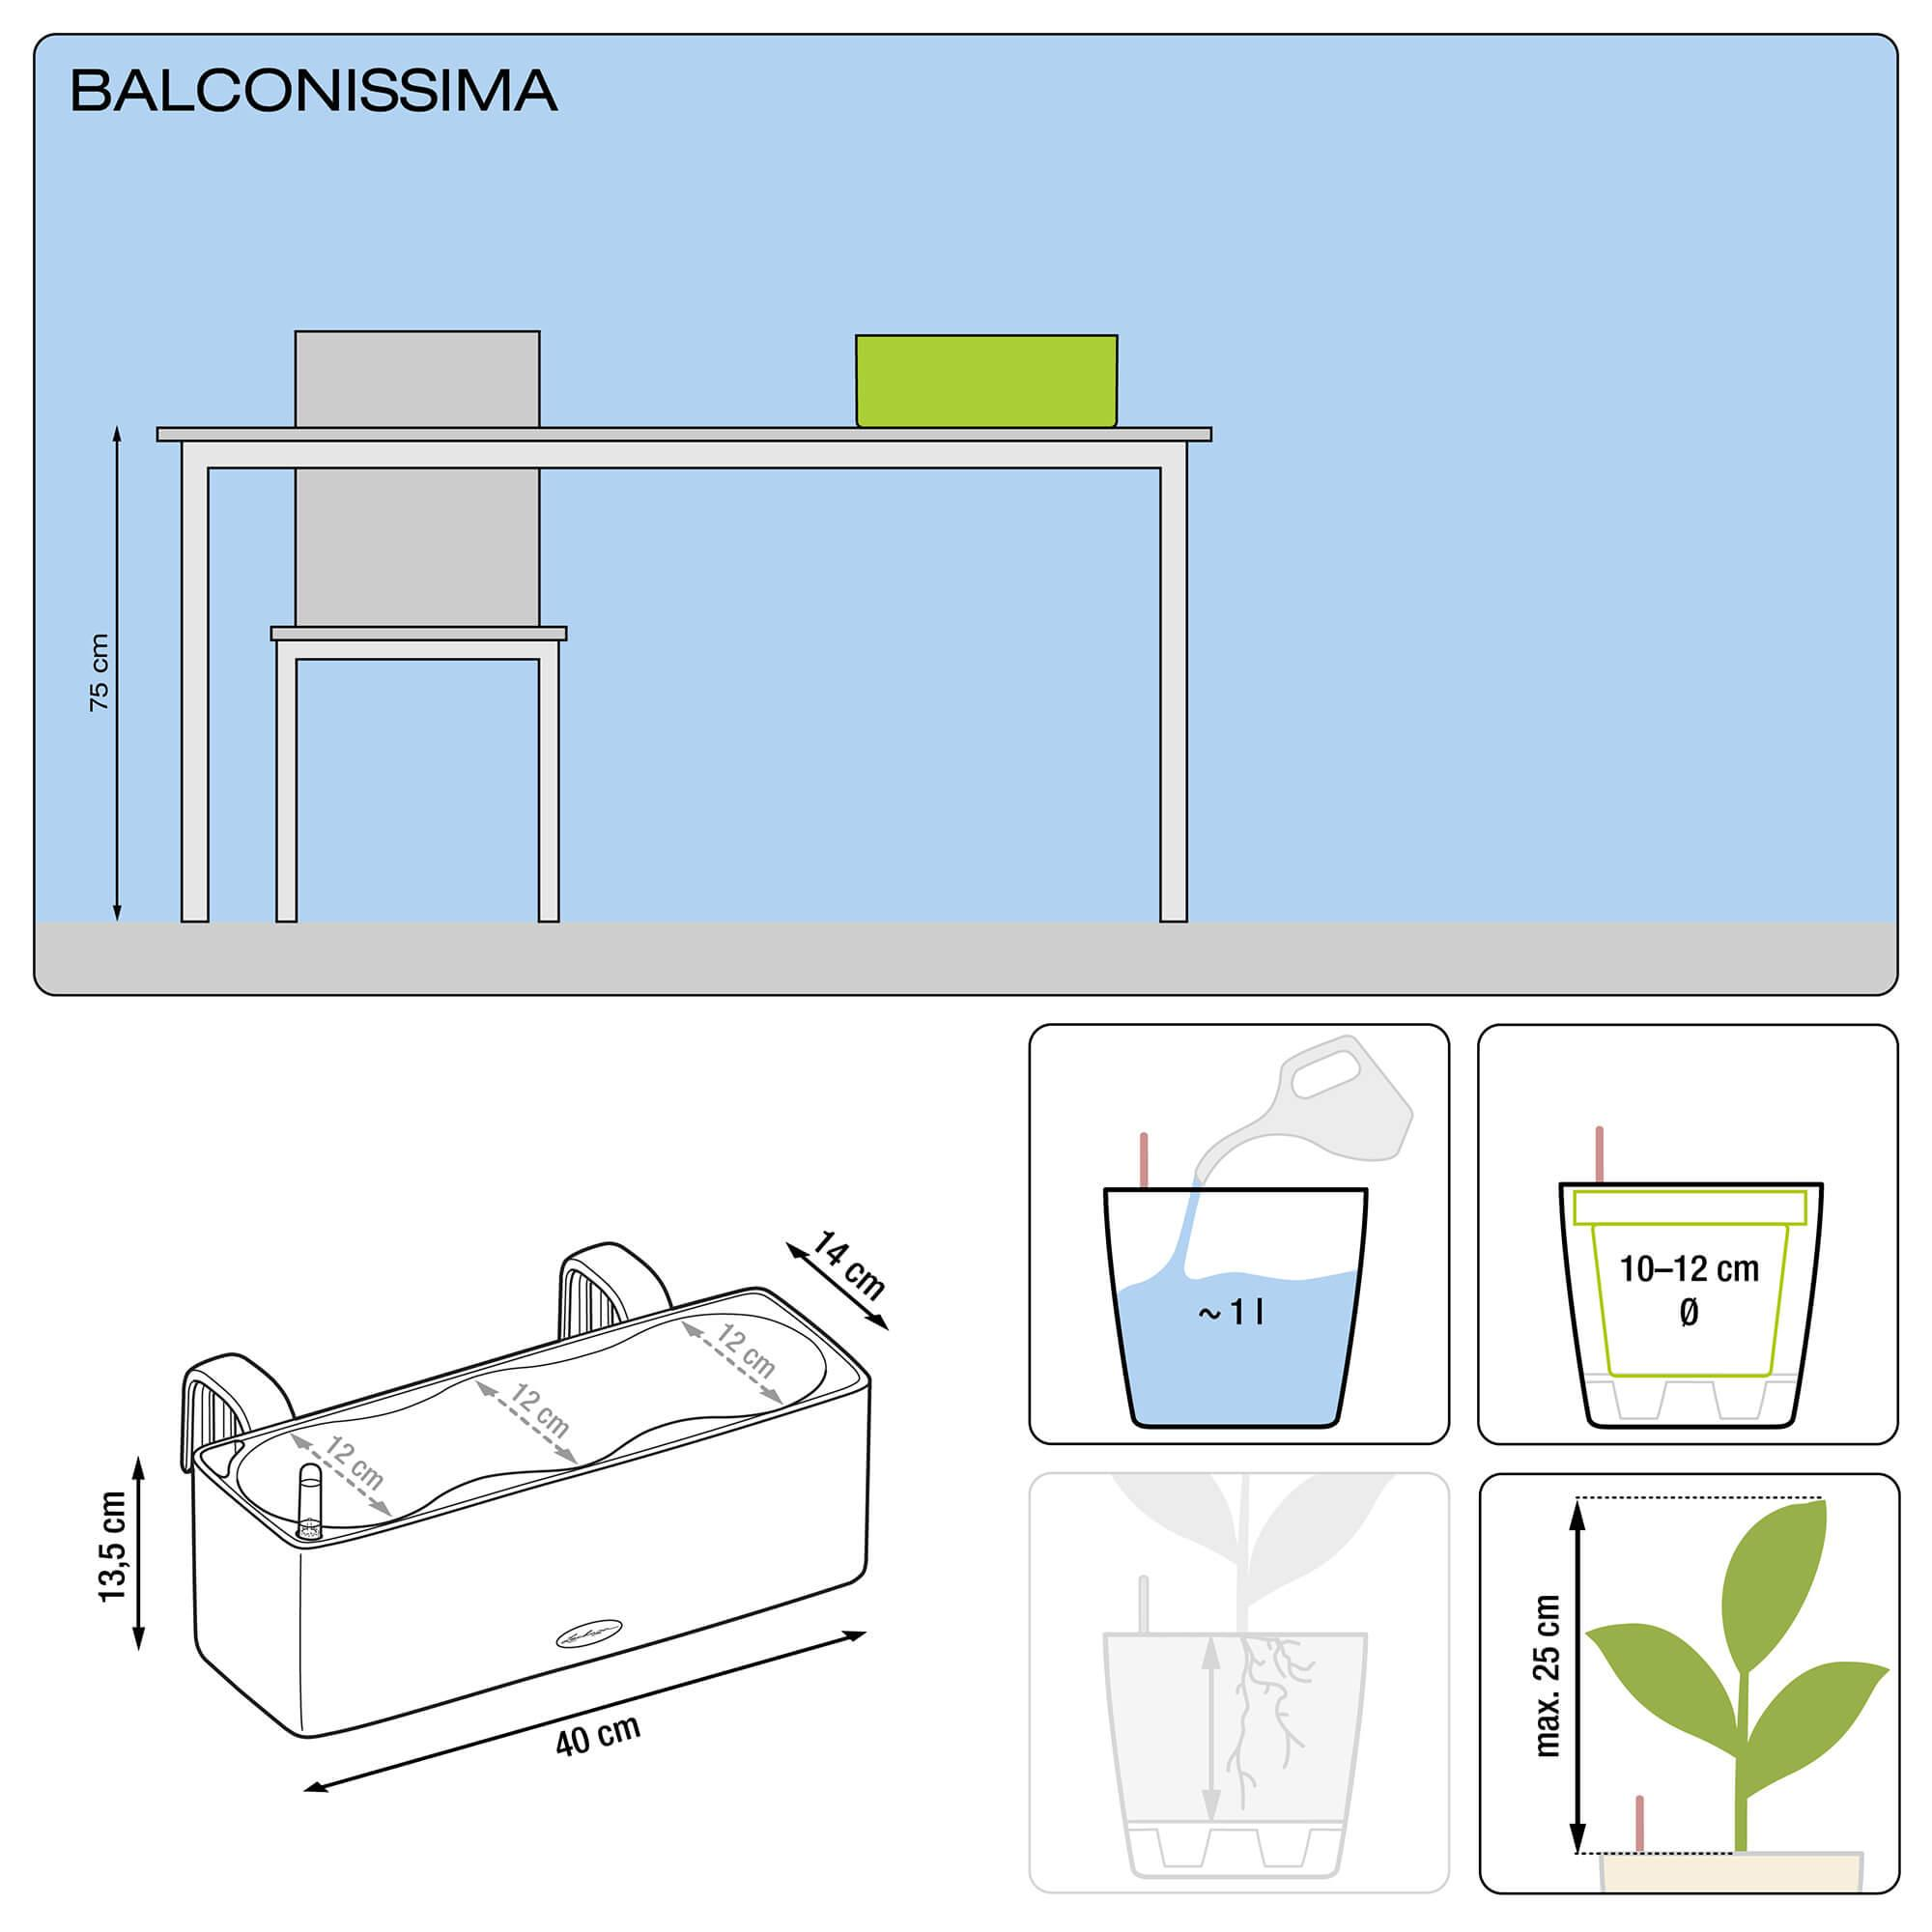 BALCONISSIMA Color slate - Image 2